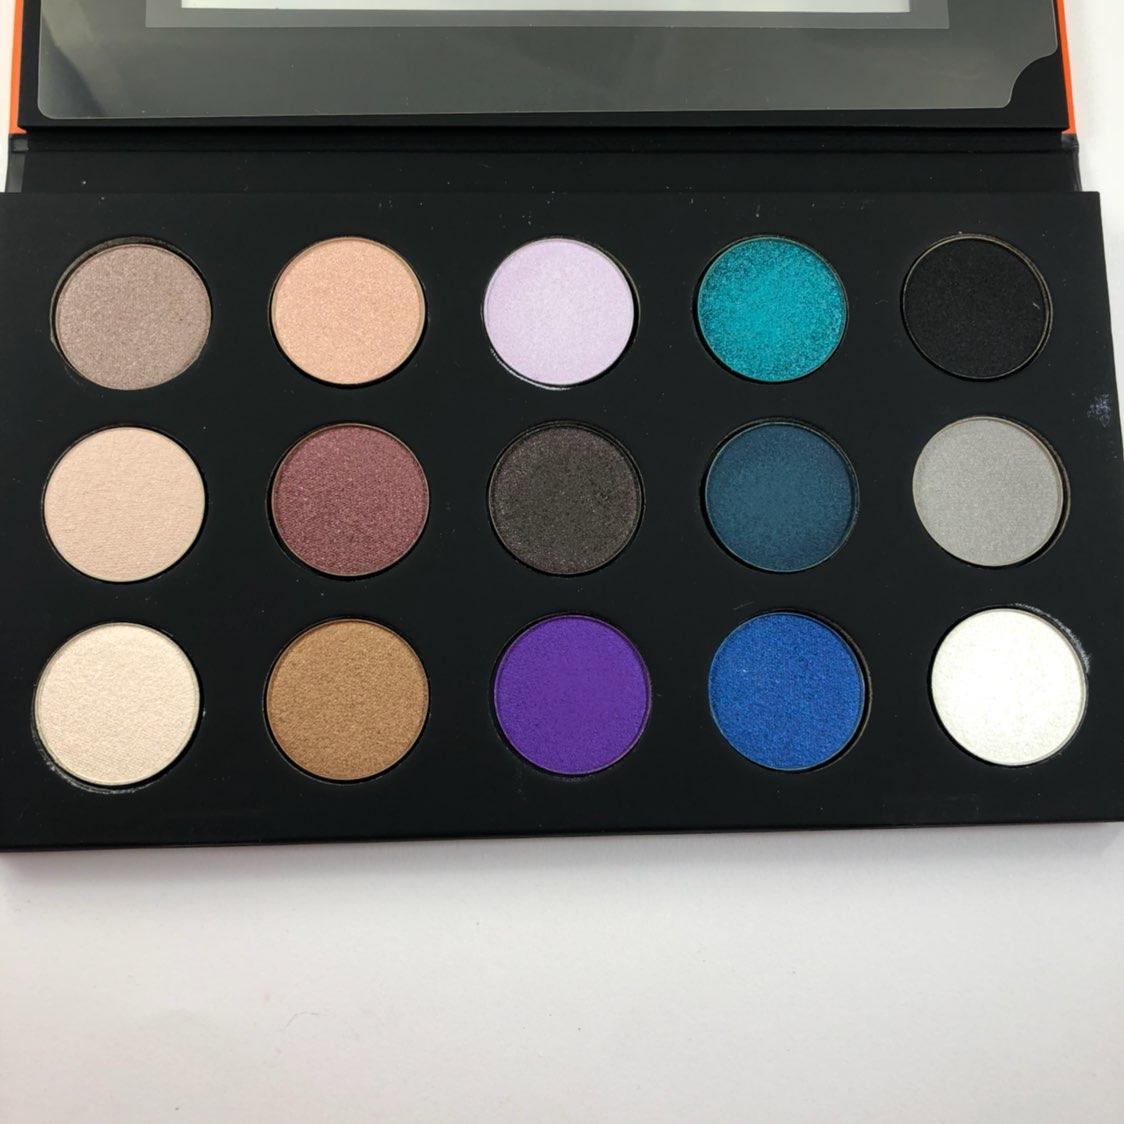 Make Up For Ever 15 Artist Palette